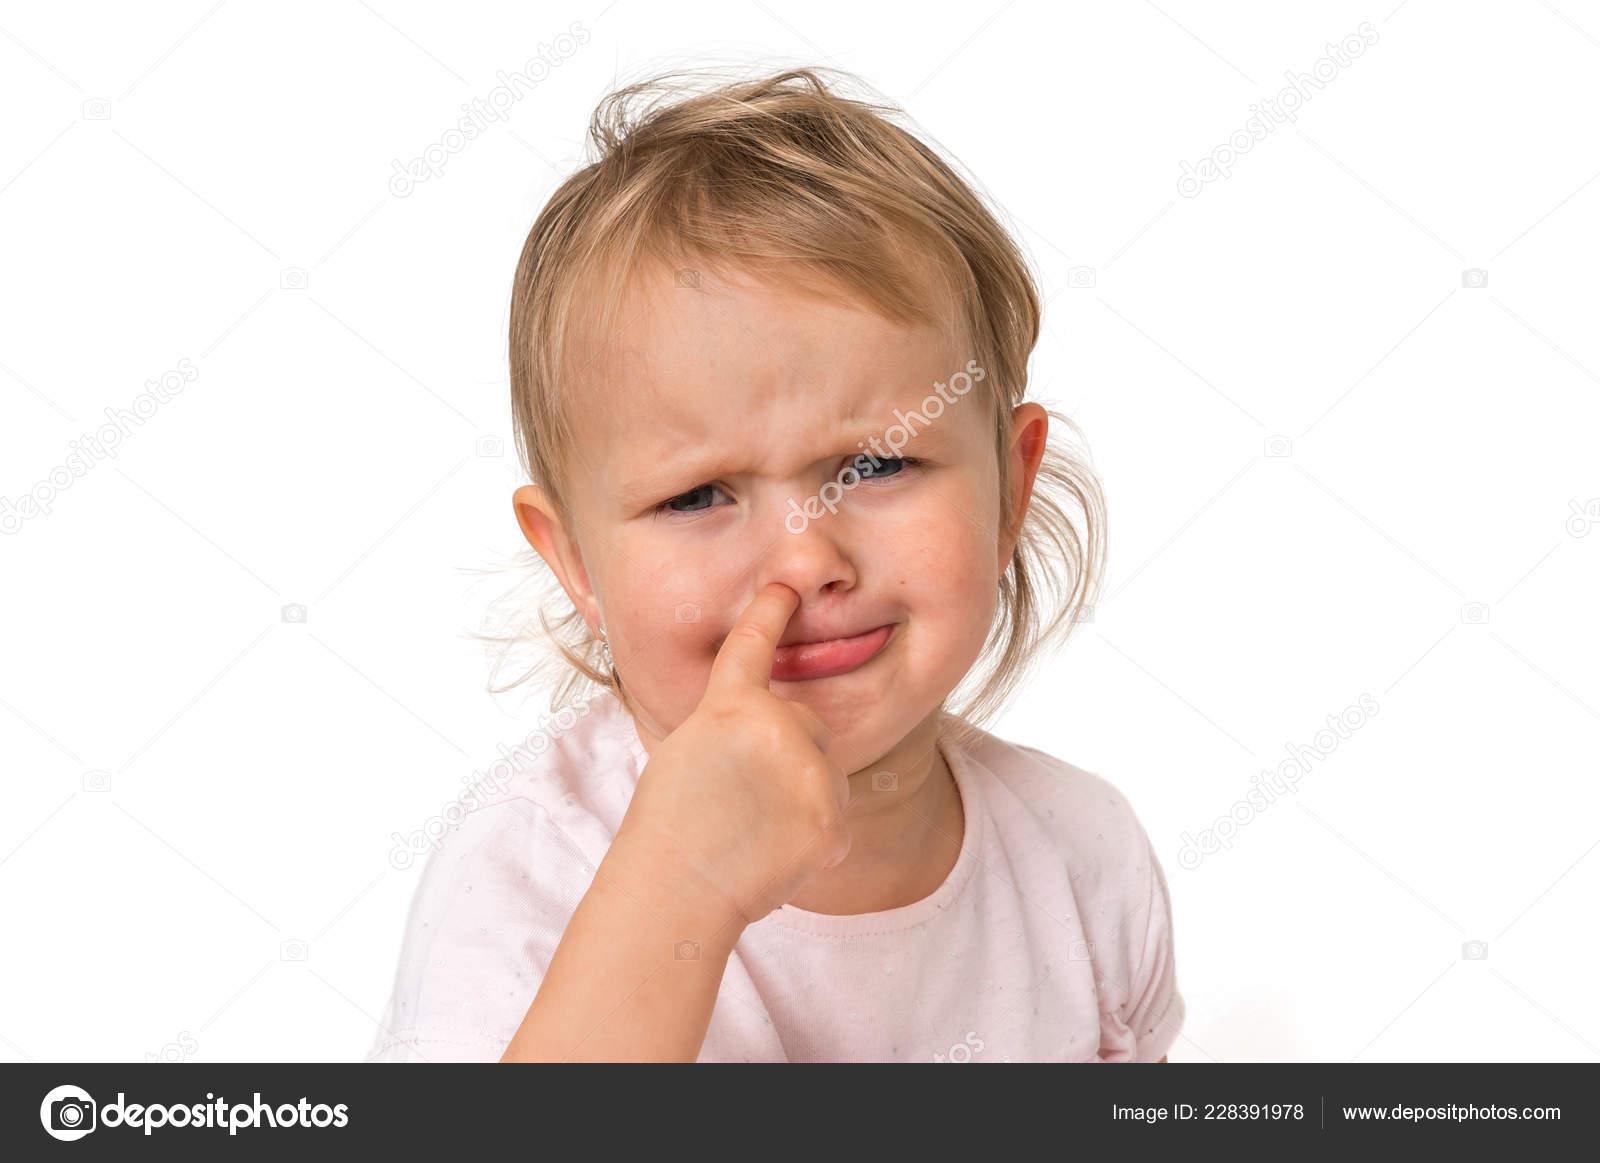 Sad baby girl images download